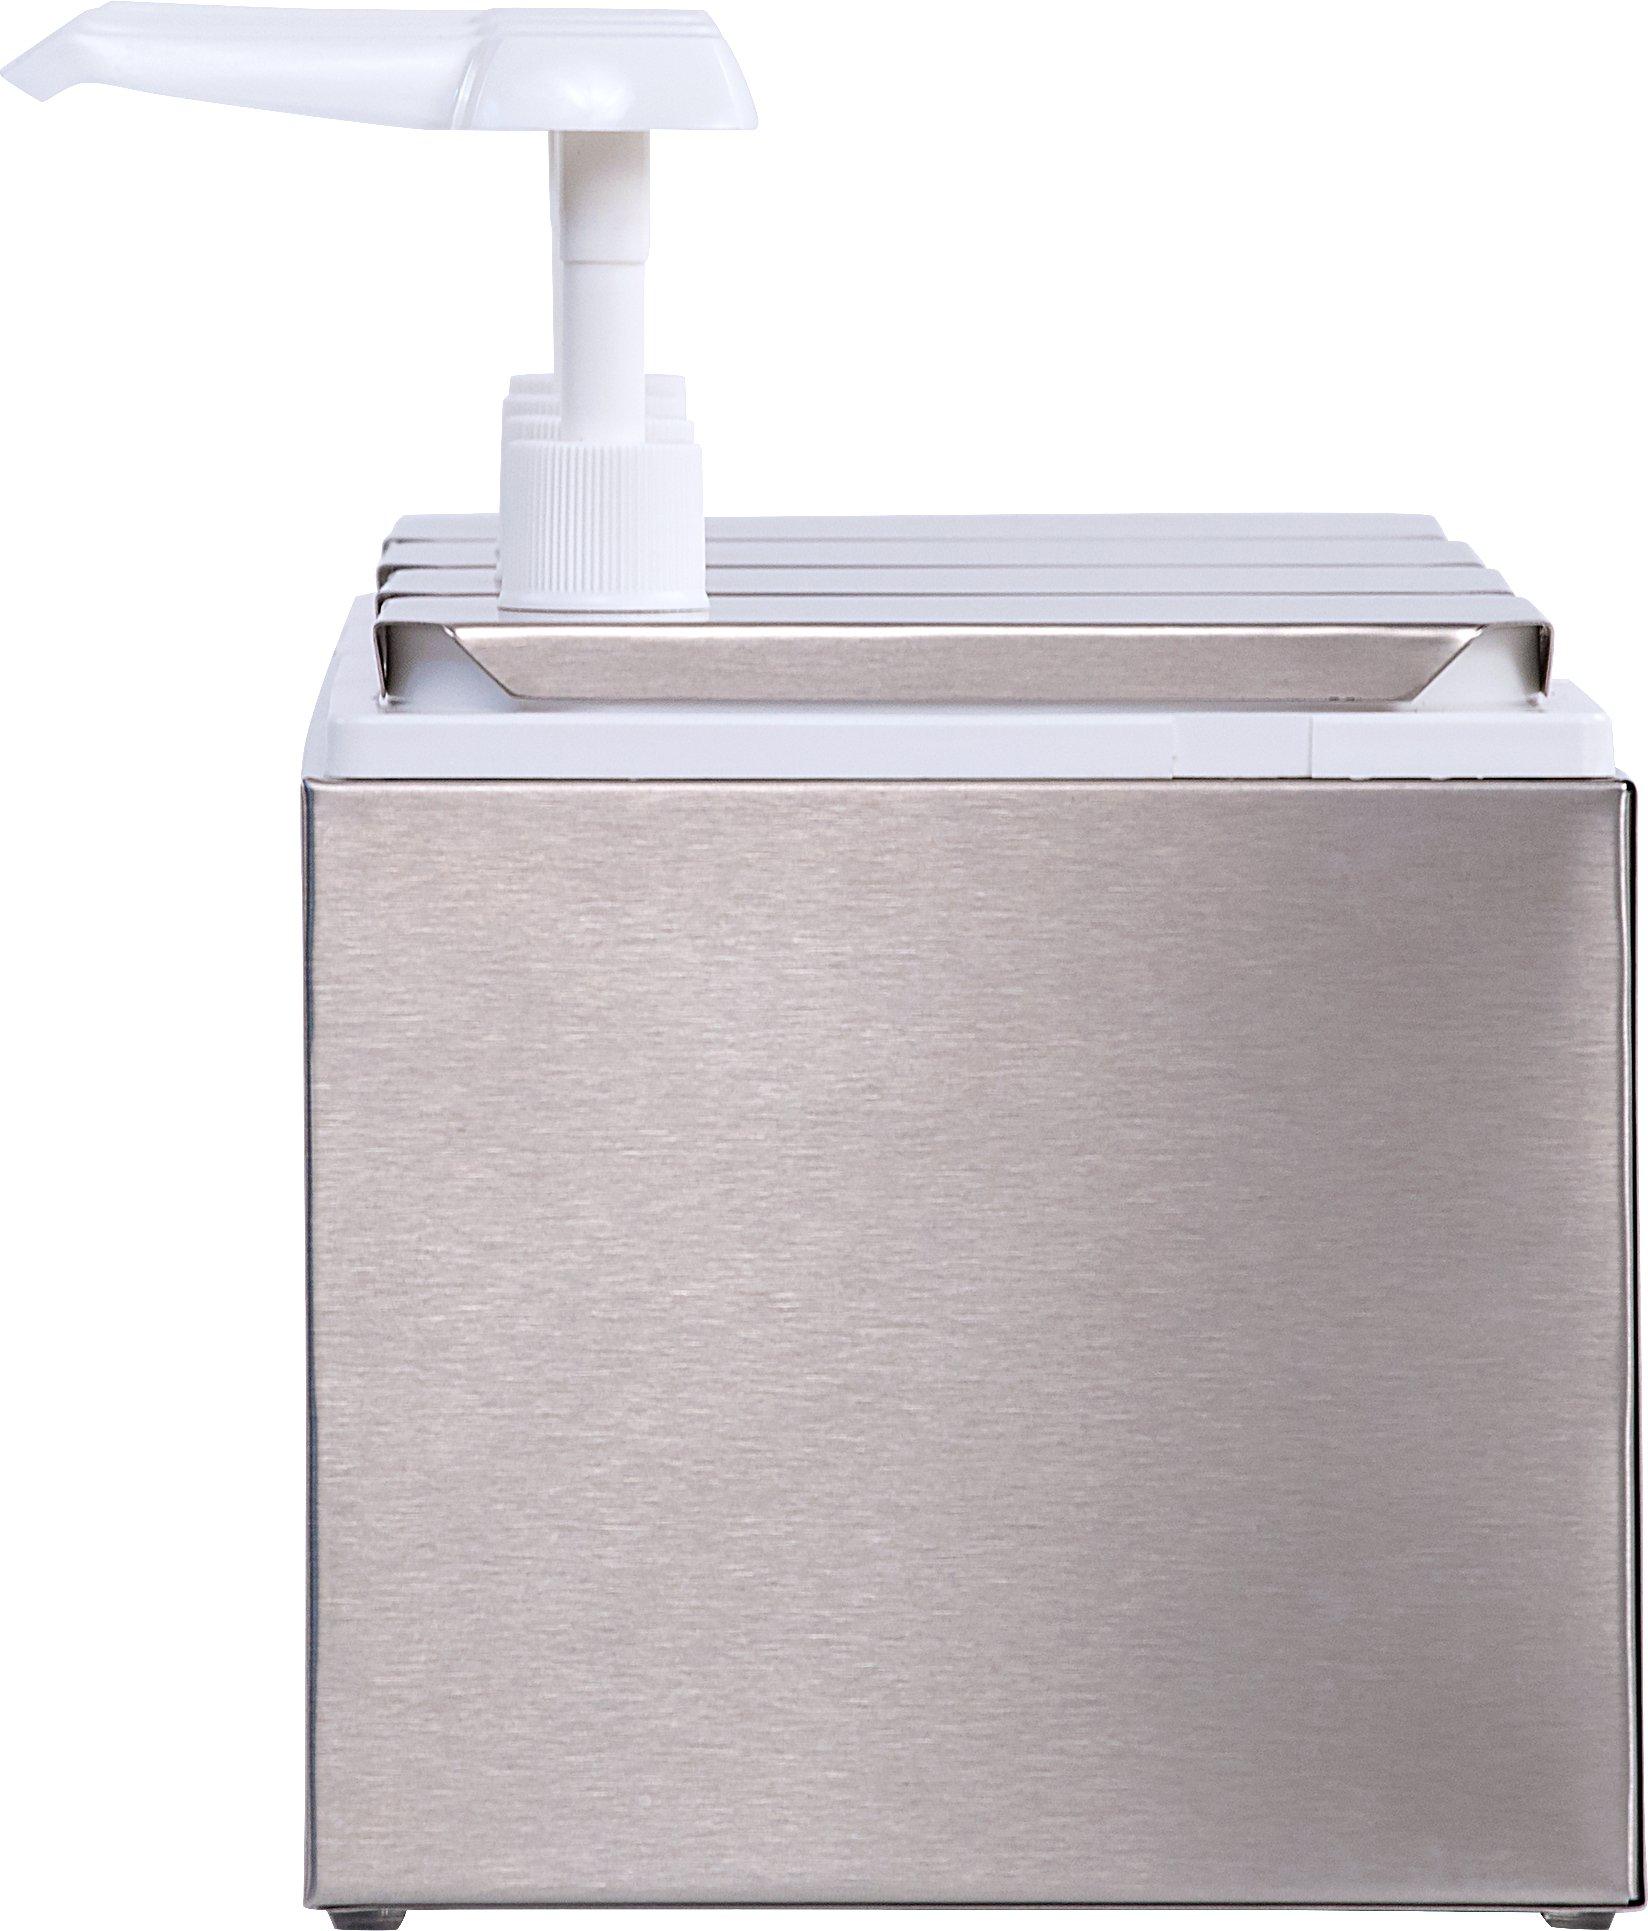 Carlisle 38504 Quadruple Condiment Pump Station with 2.5 Quart Jars by Carlisle (Image #3)